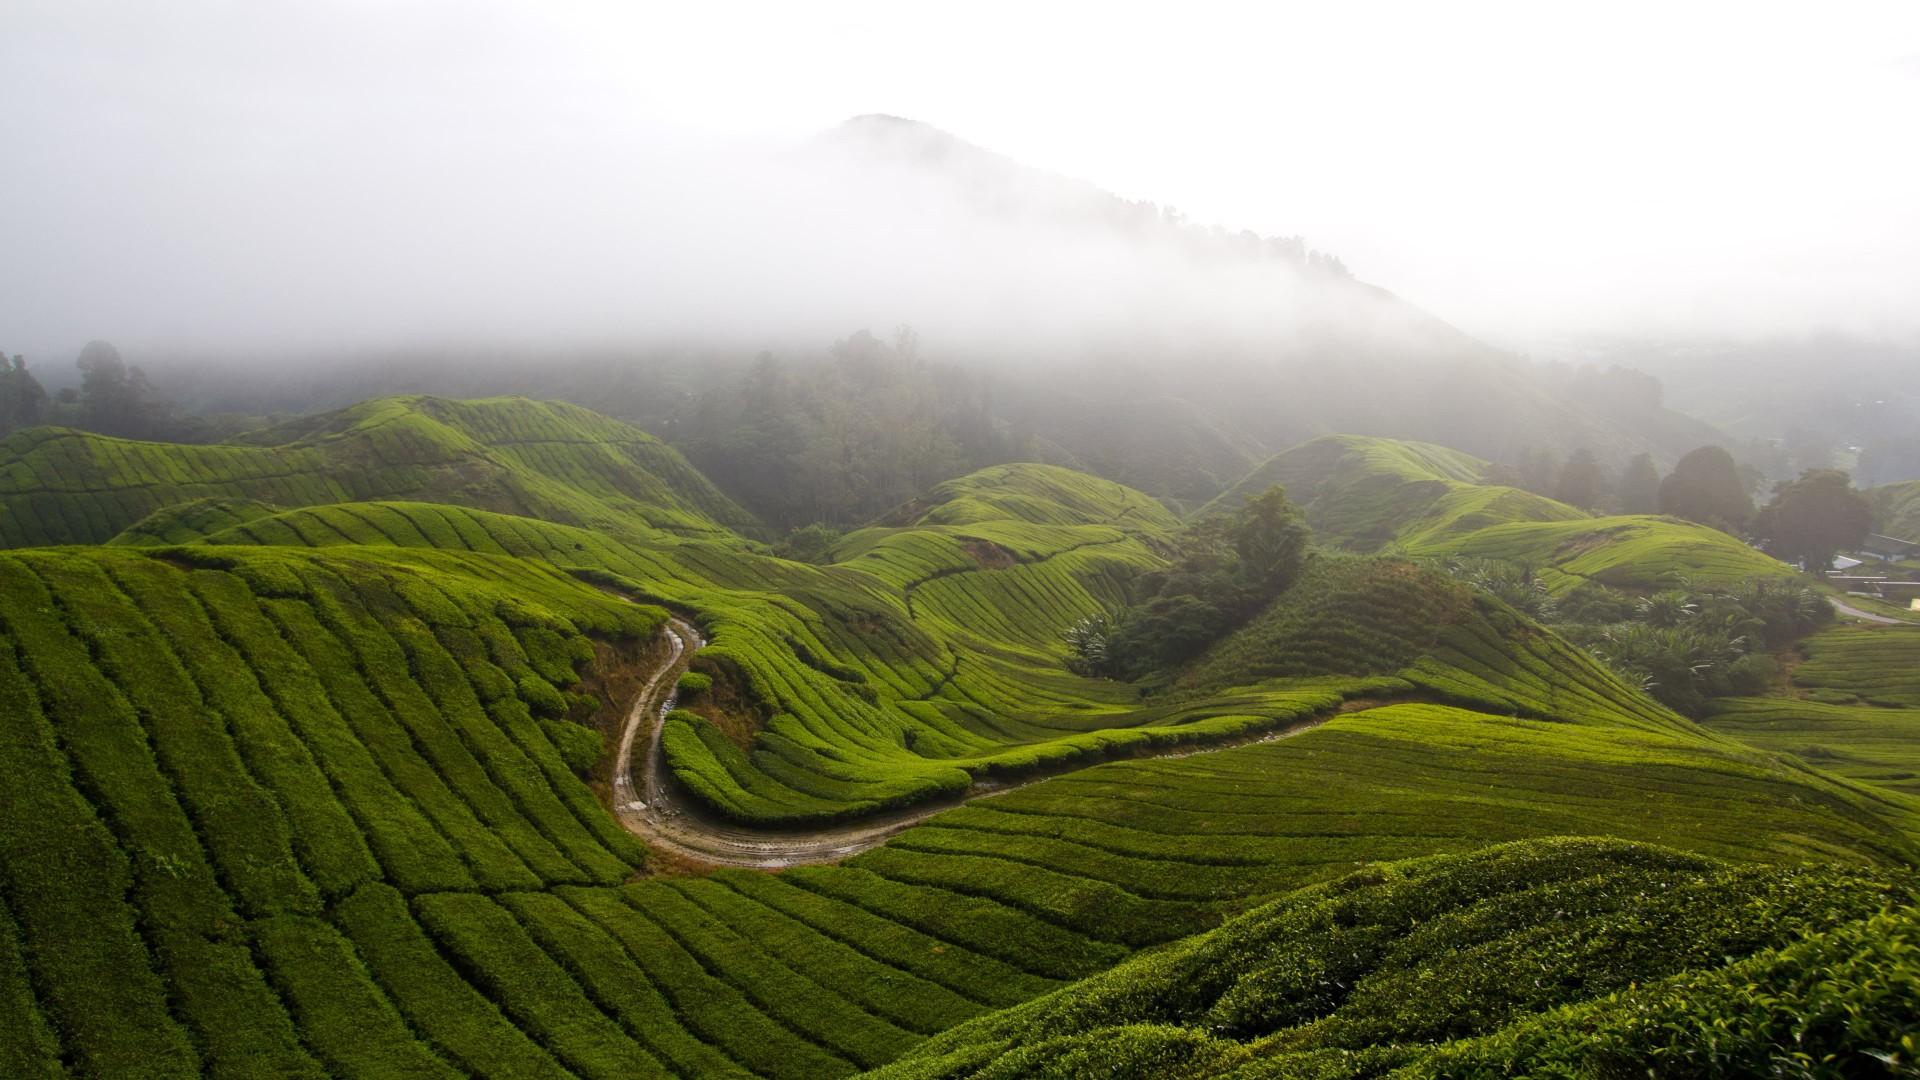 Toyota Ft 86 >> Wallpaper Cameron Highlands, 5k, 4k wallpaper, Malaysia, meadows, fog, sky, Nature #6126